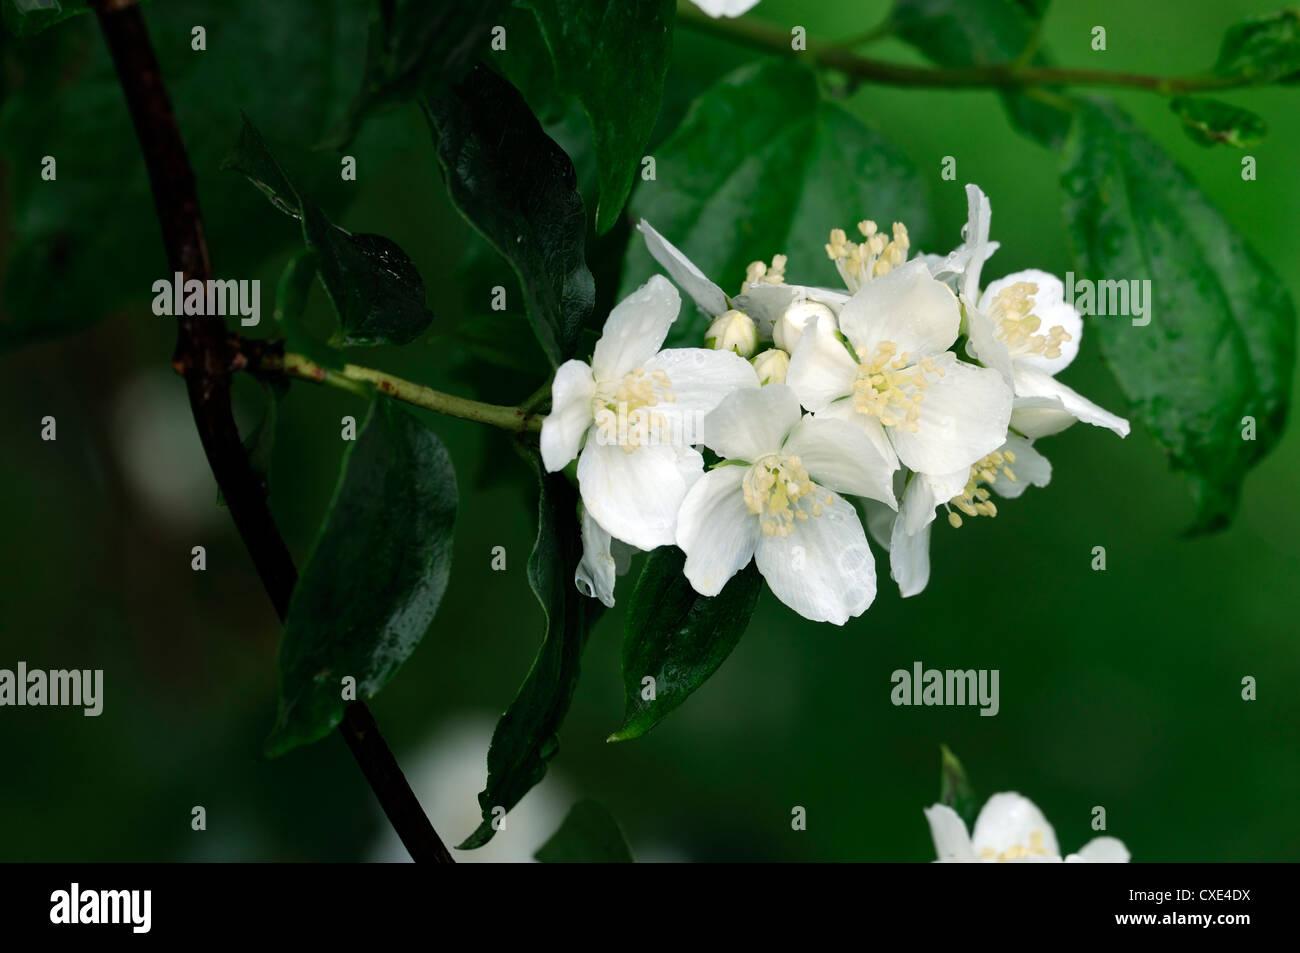 White flowering philadelphus mock orange flowers fragrant stock philadelphus lewisii white flower flowers flowering deciduous shrubs scented fragrant closeup mock orange stock image mightylinksfo